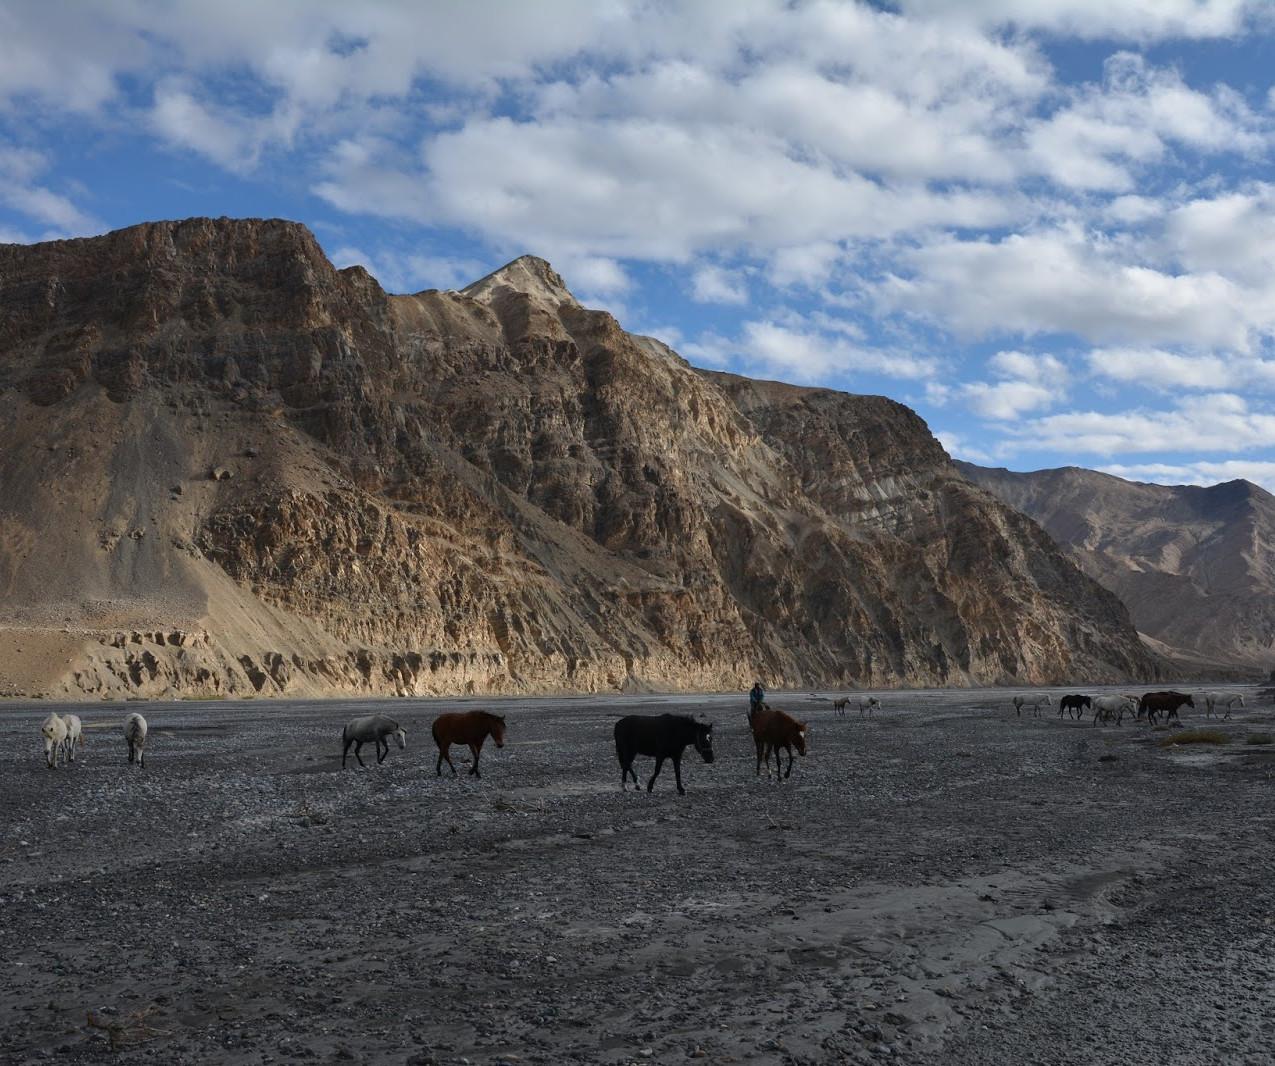 Ladakh-Spiti-2016-DSC_5778